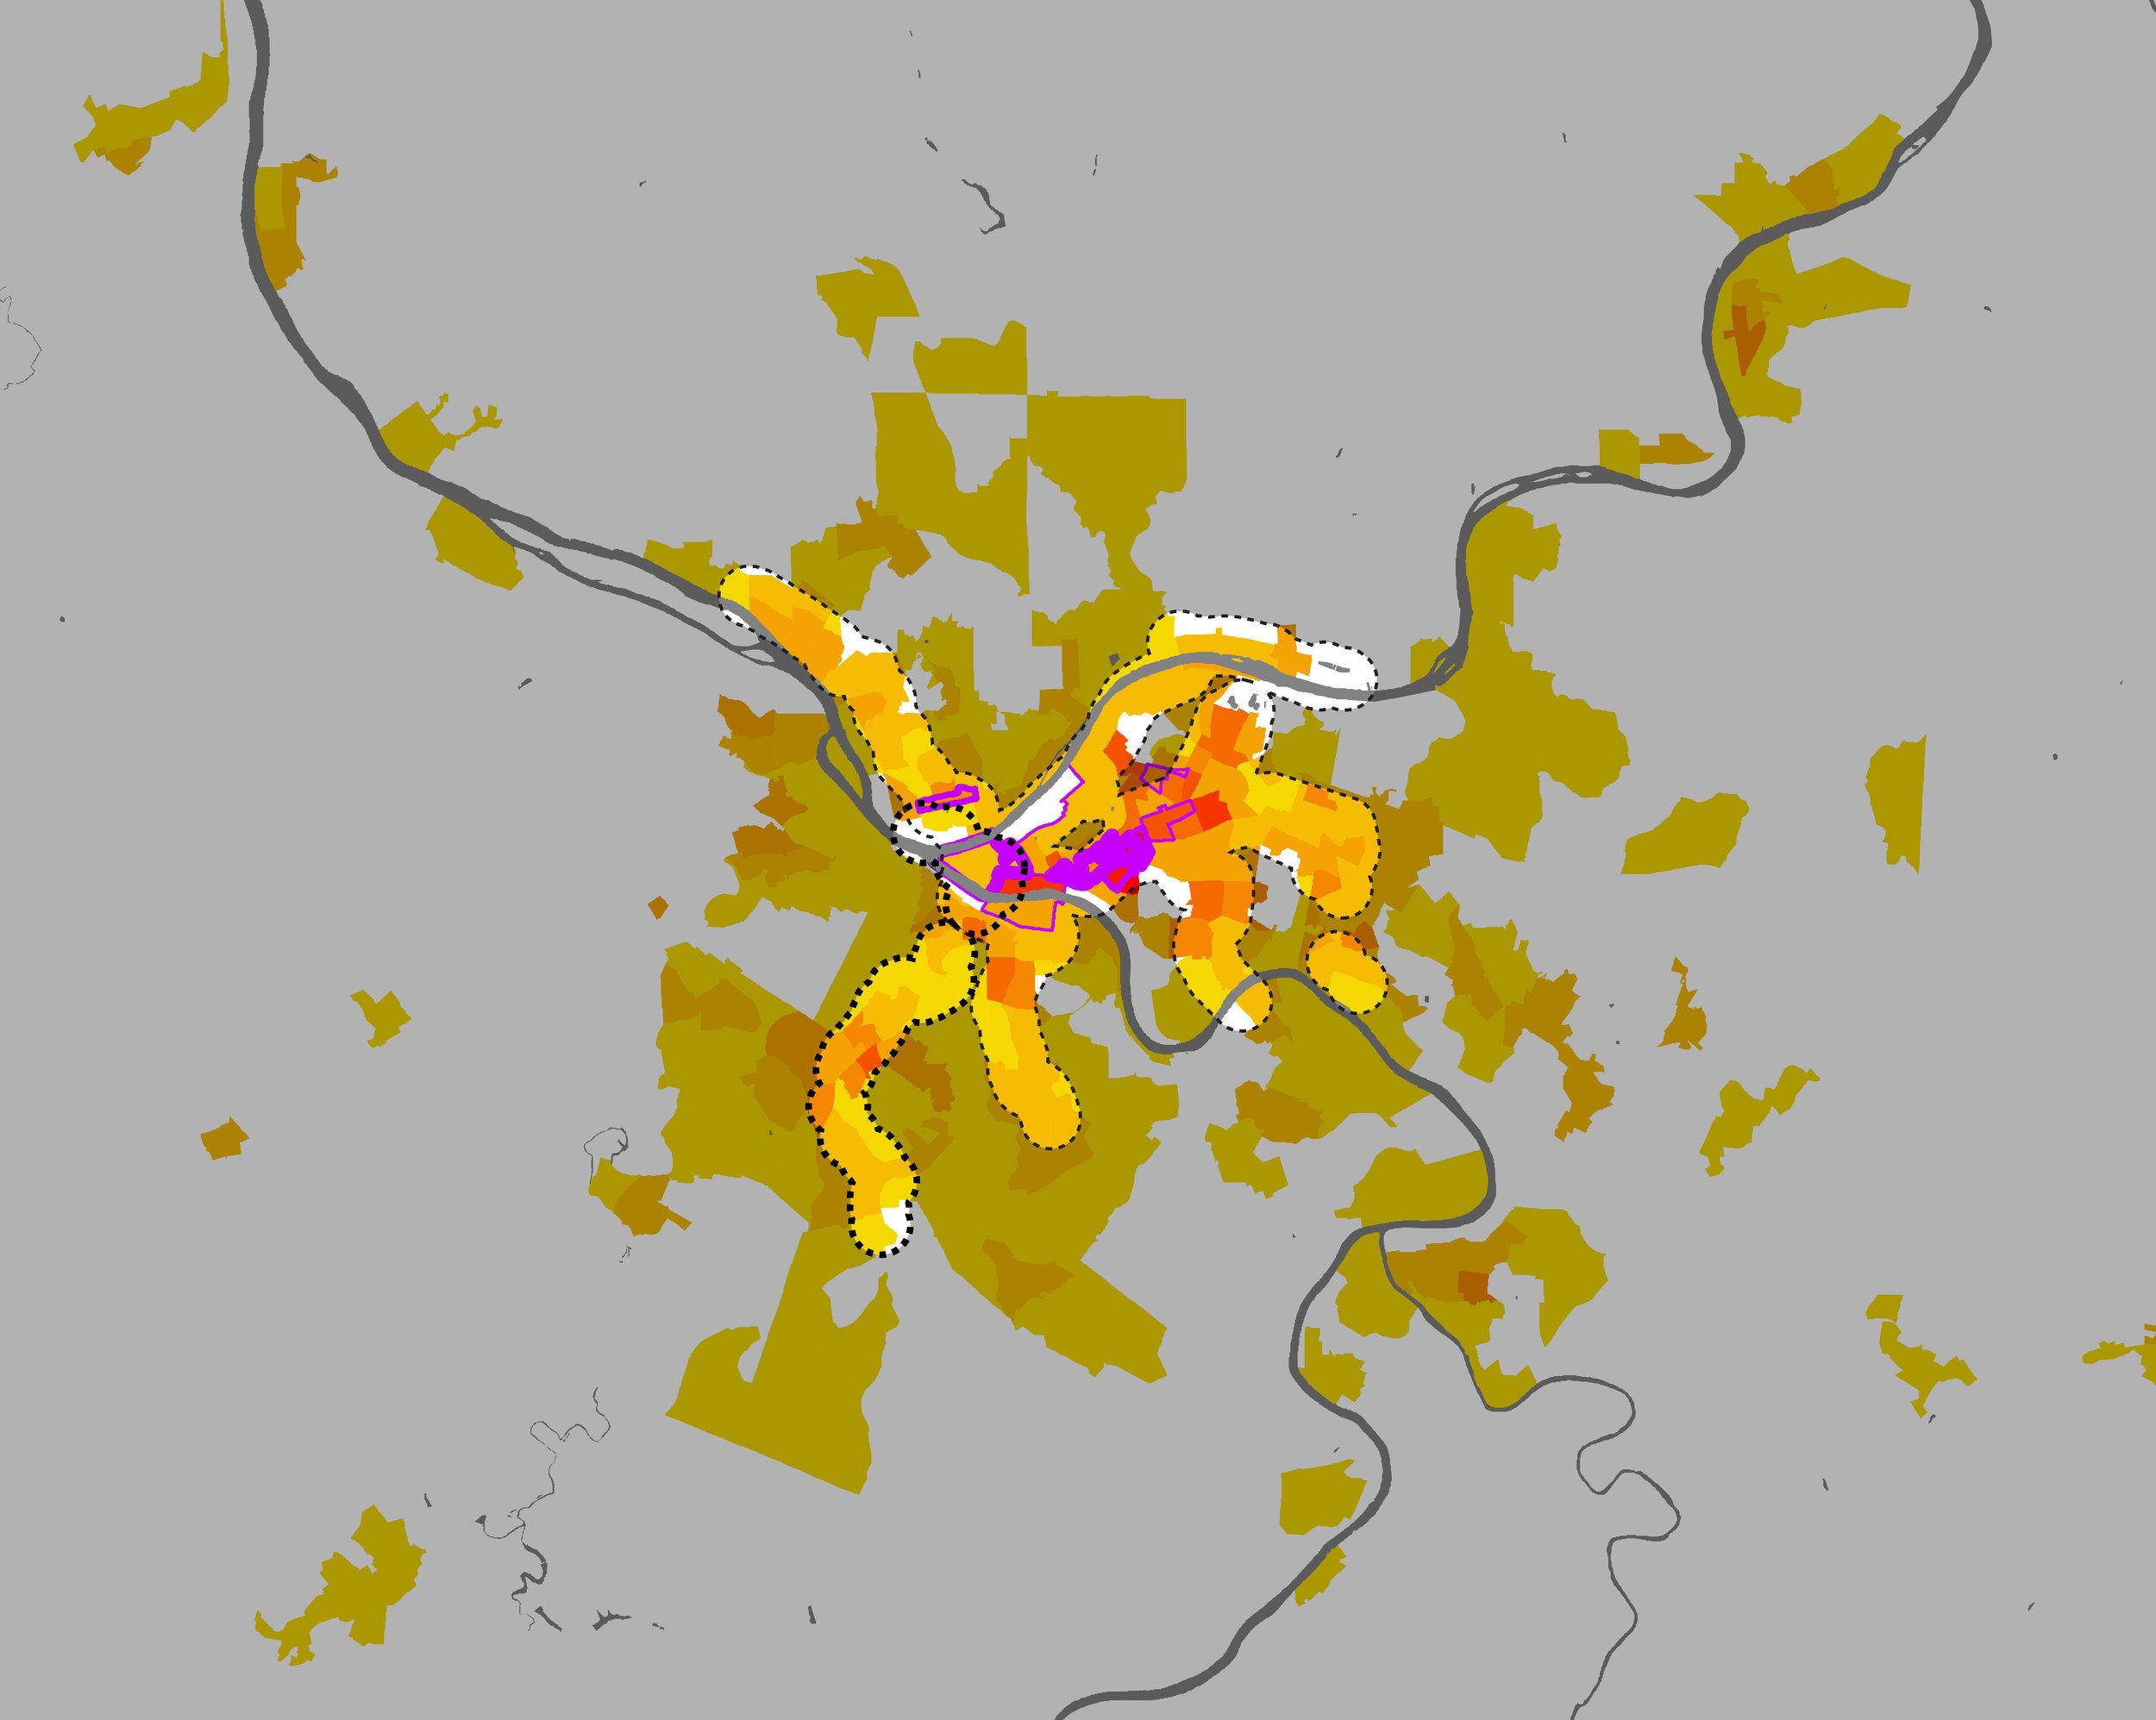 pittsburgh density corrected.jpg